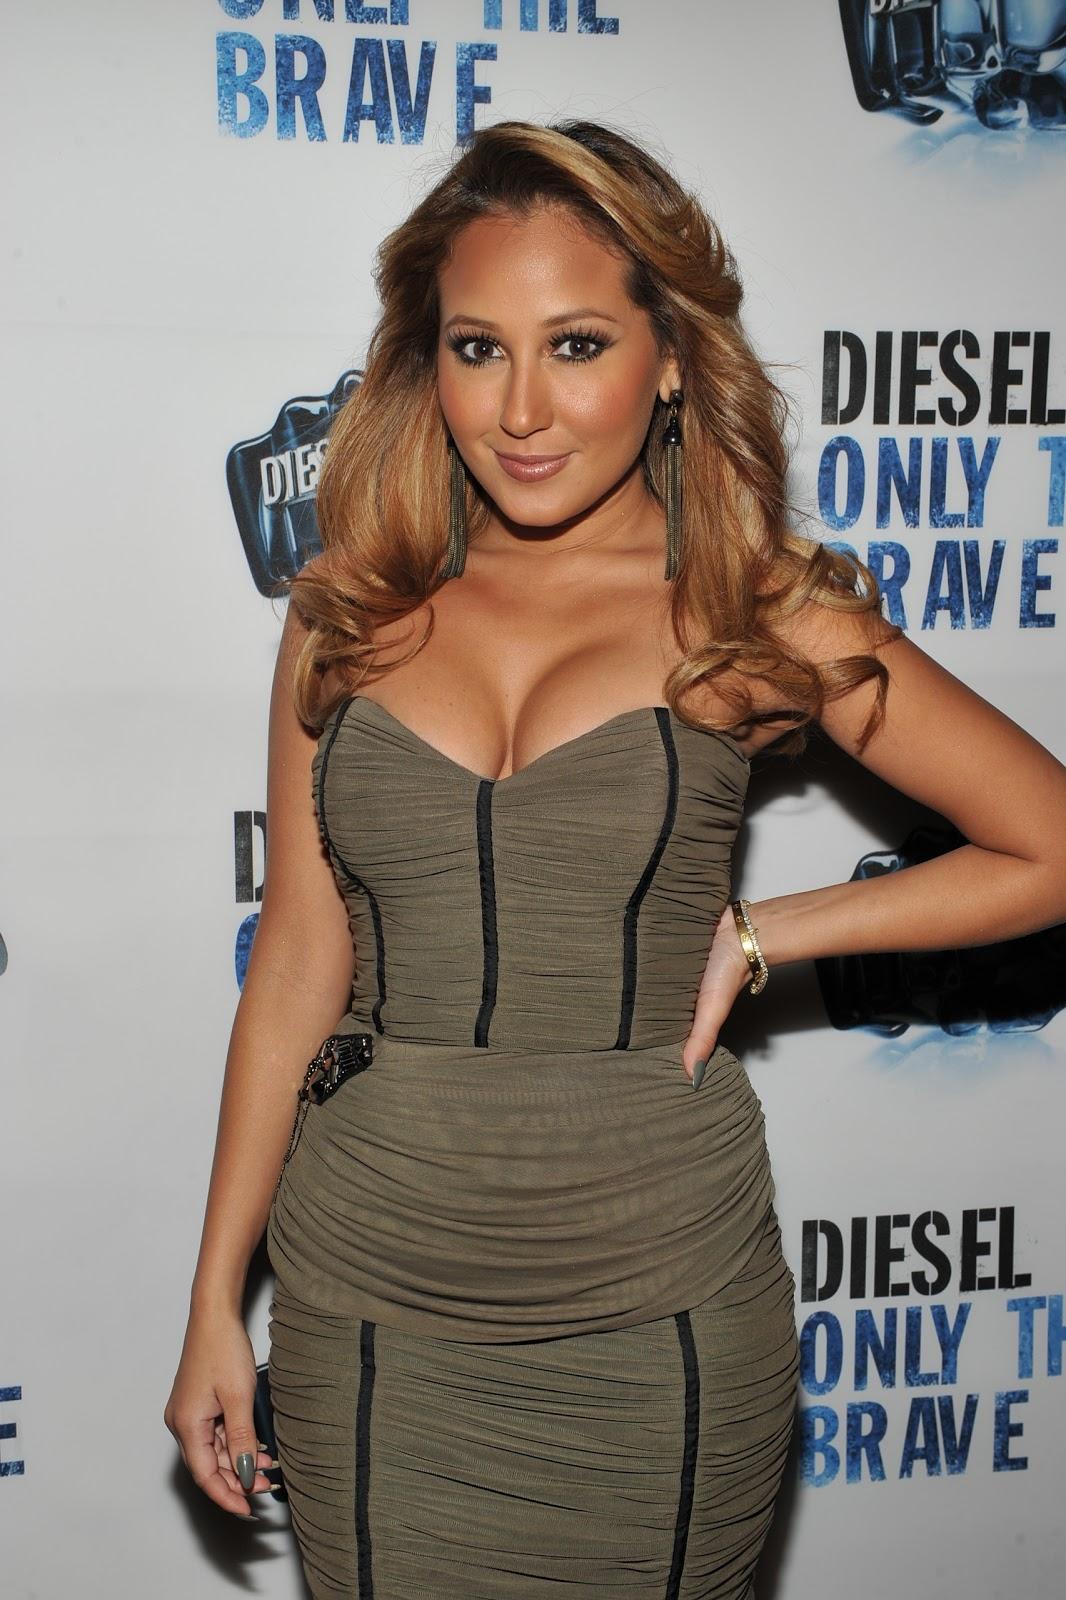 http://4.bp.blogspot.com/_1yUTJlWJ-7U/TL2OnCeV_dI/AAAAAAAABNM/hrvONKHjyJY/s1600/Adrienne%2BBailon.jpg